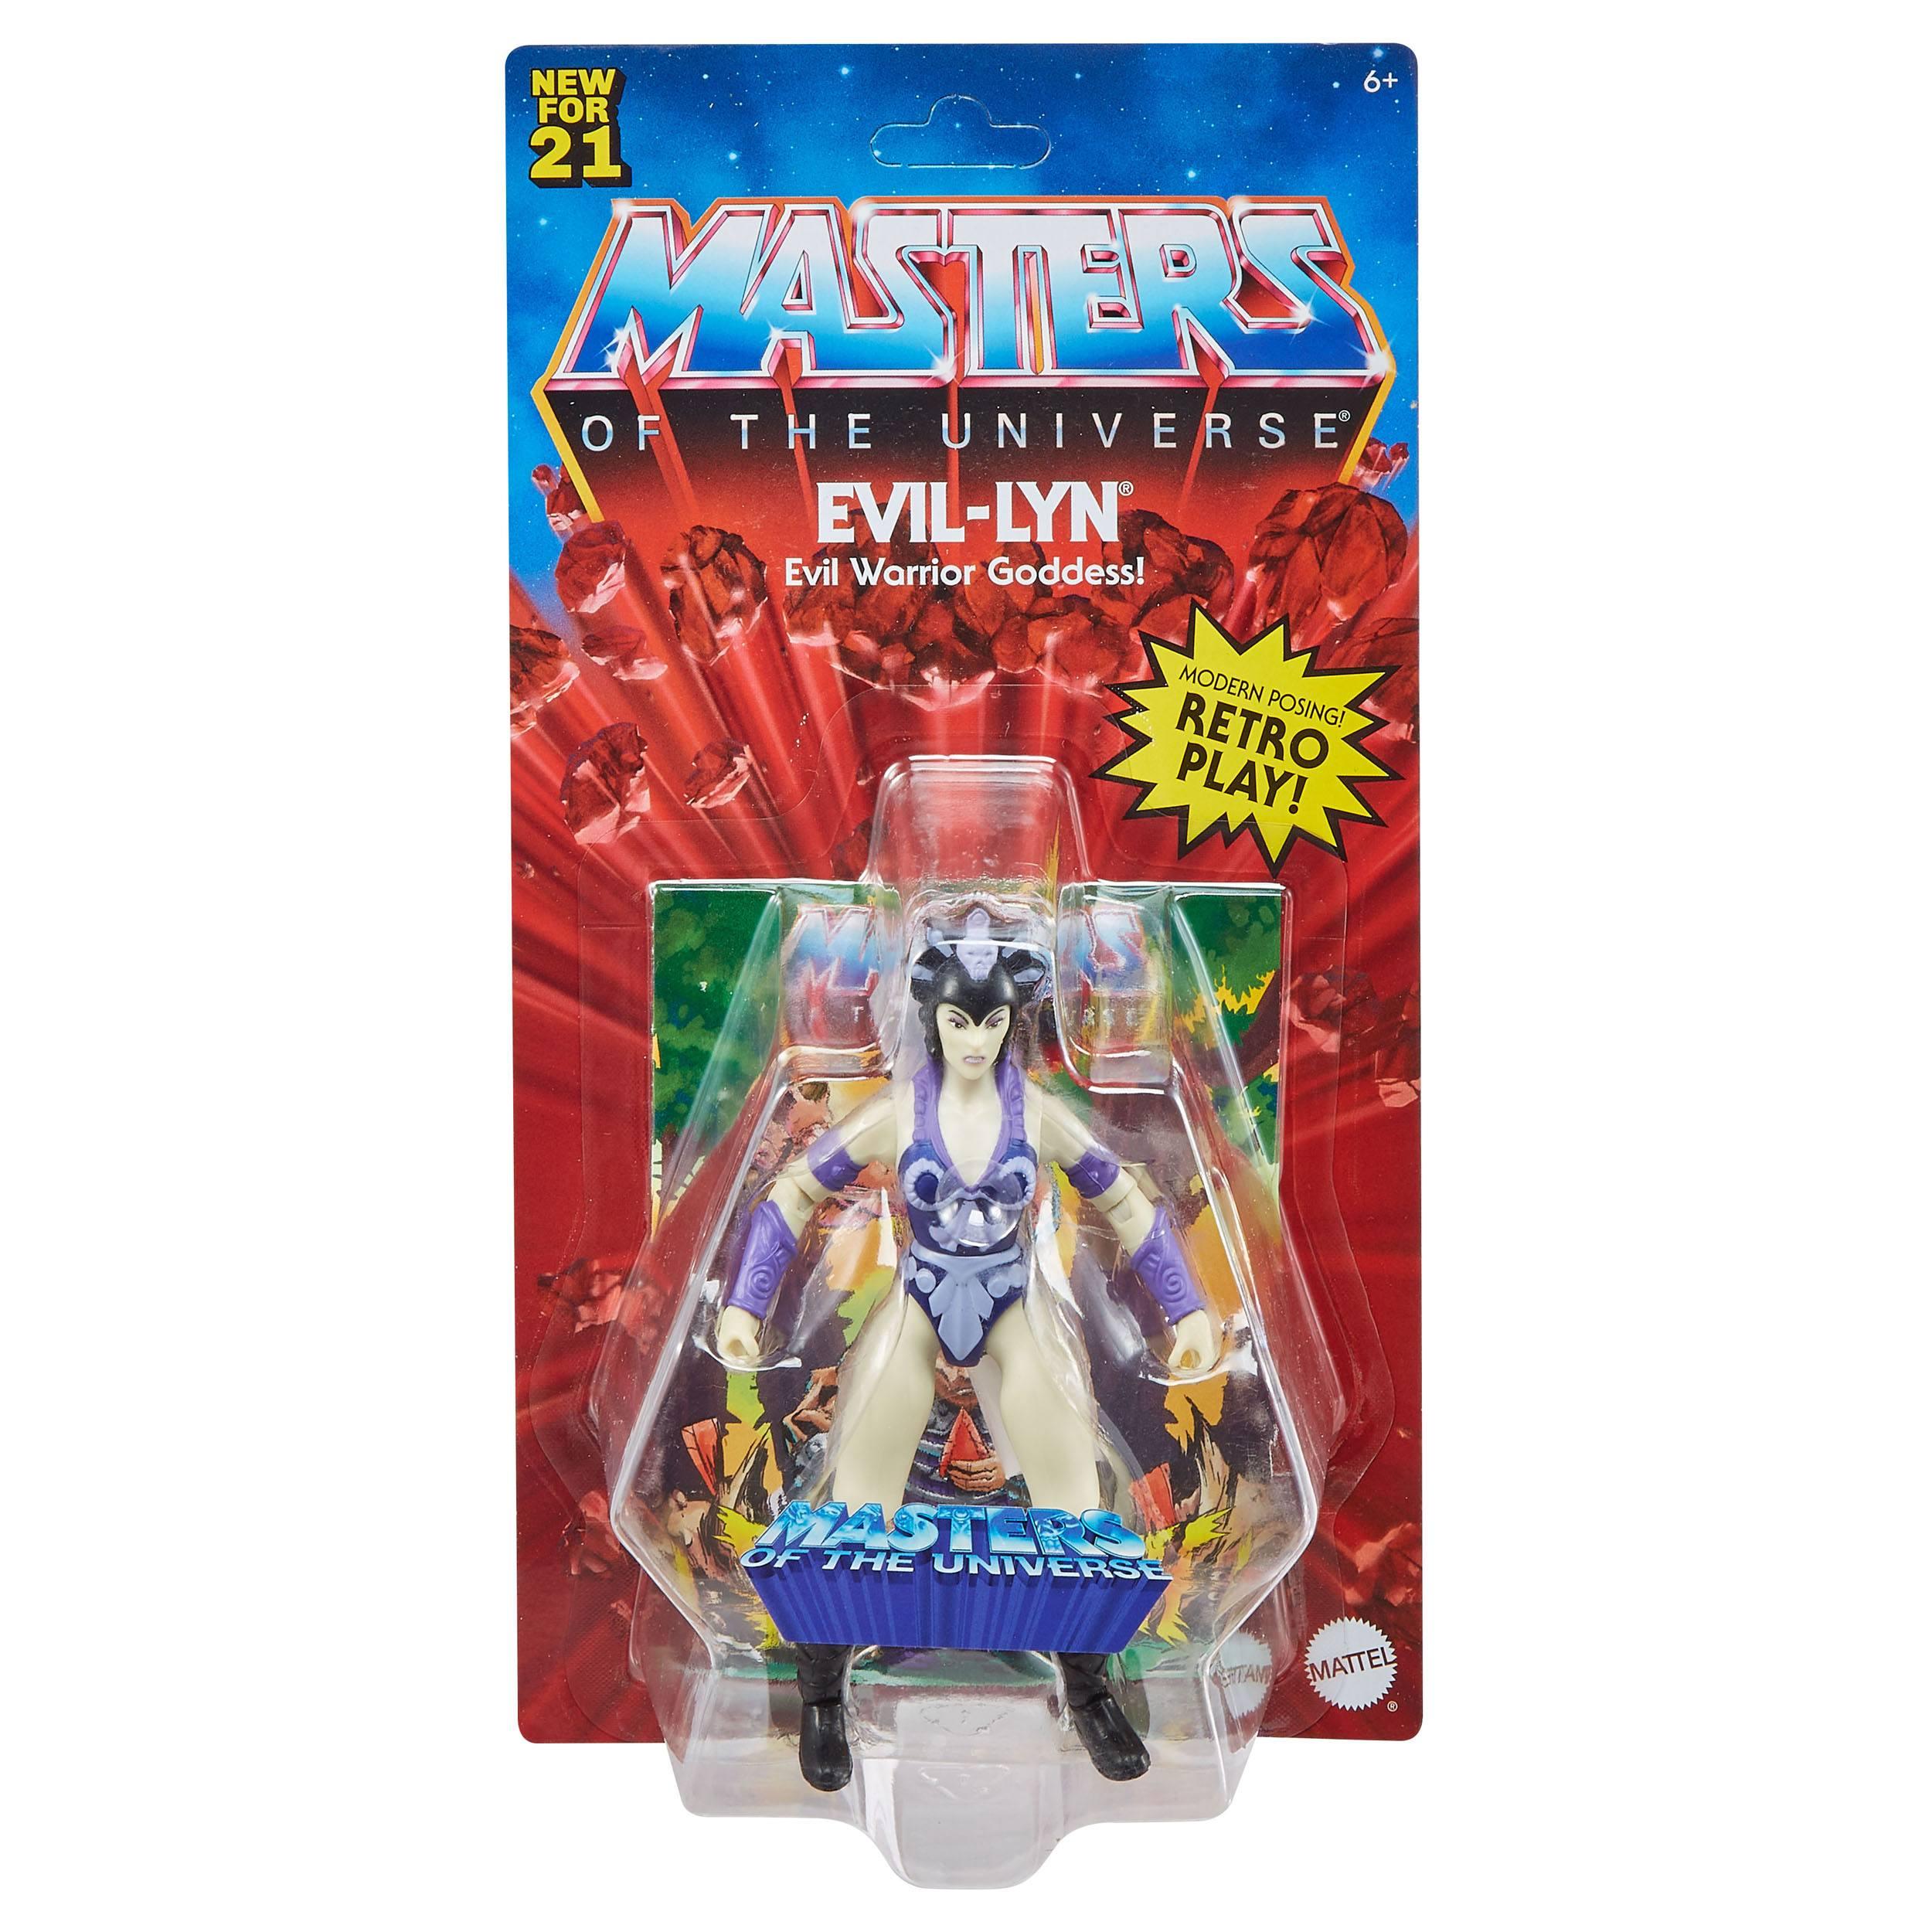 Masters of the Universe Origins Actionfigur 2021 Evil-Lyn 2 14 cm (EU Karte) GYY22 887961982879